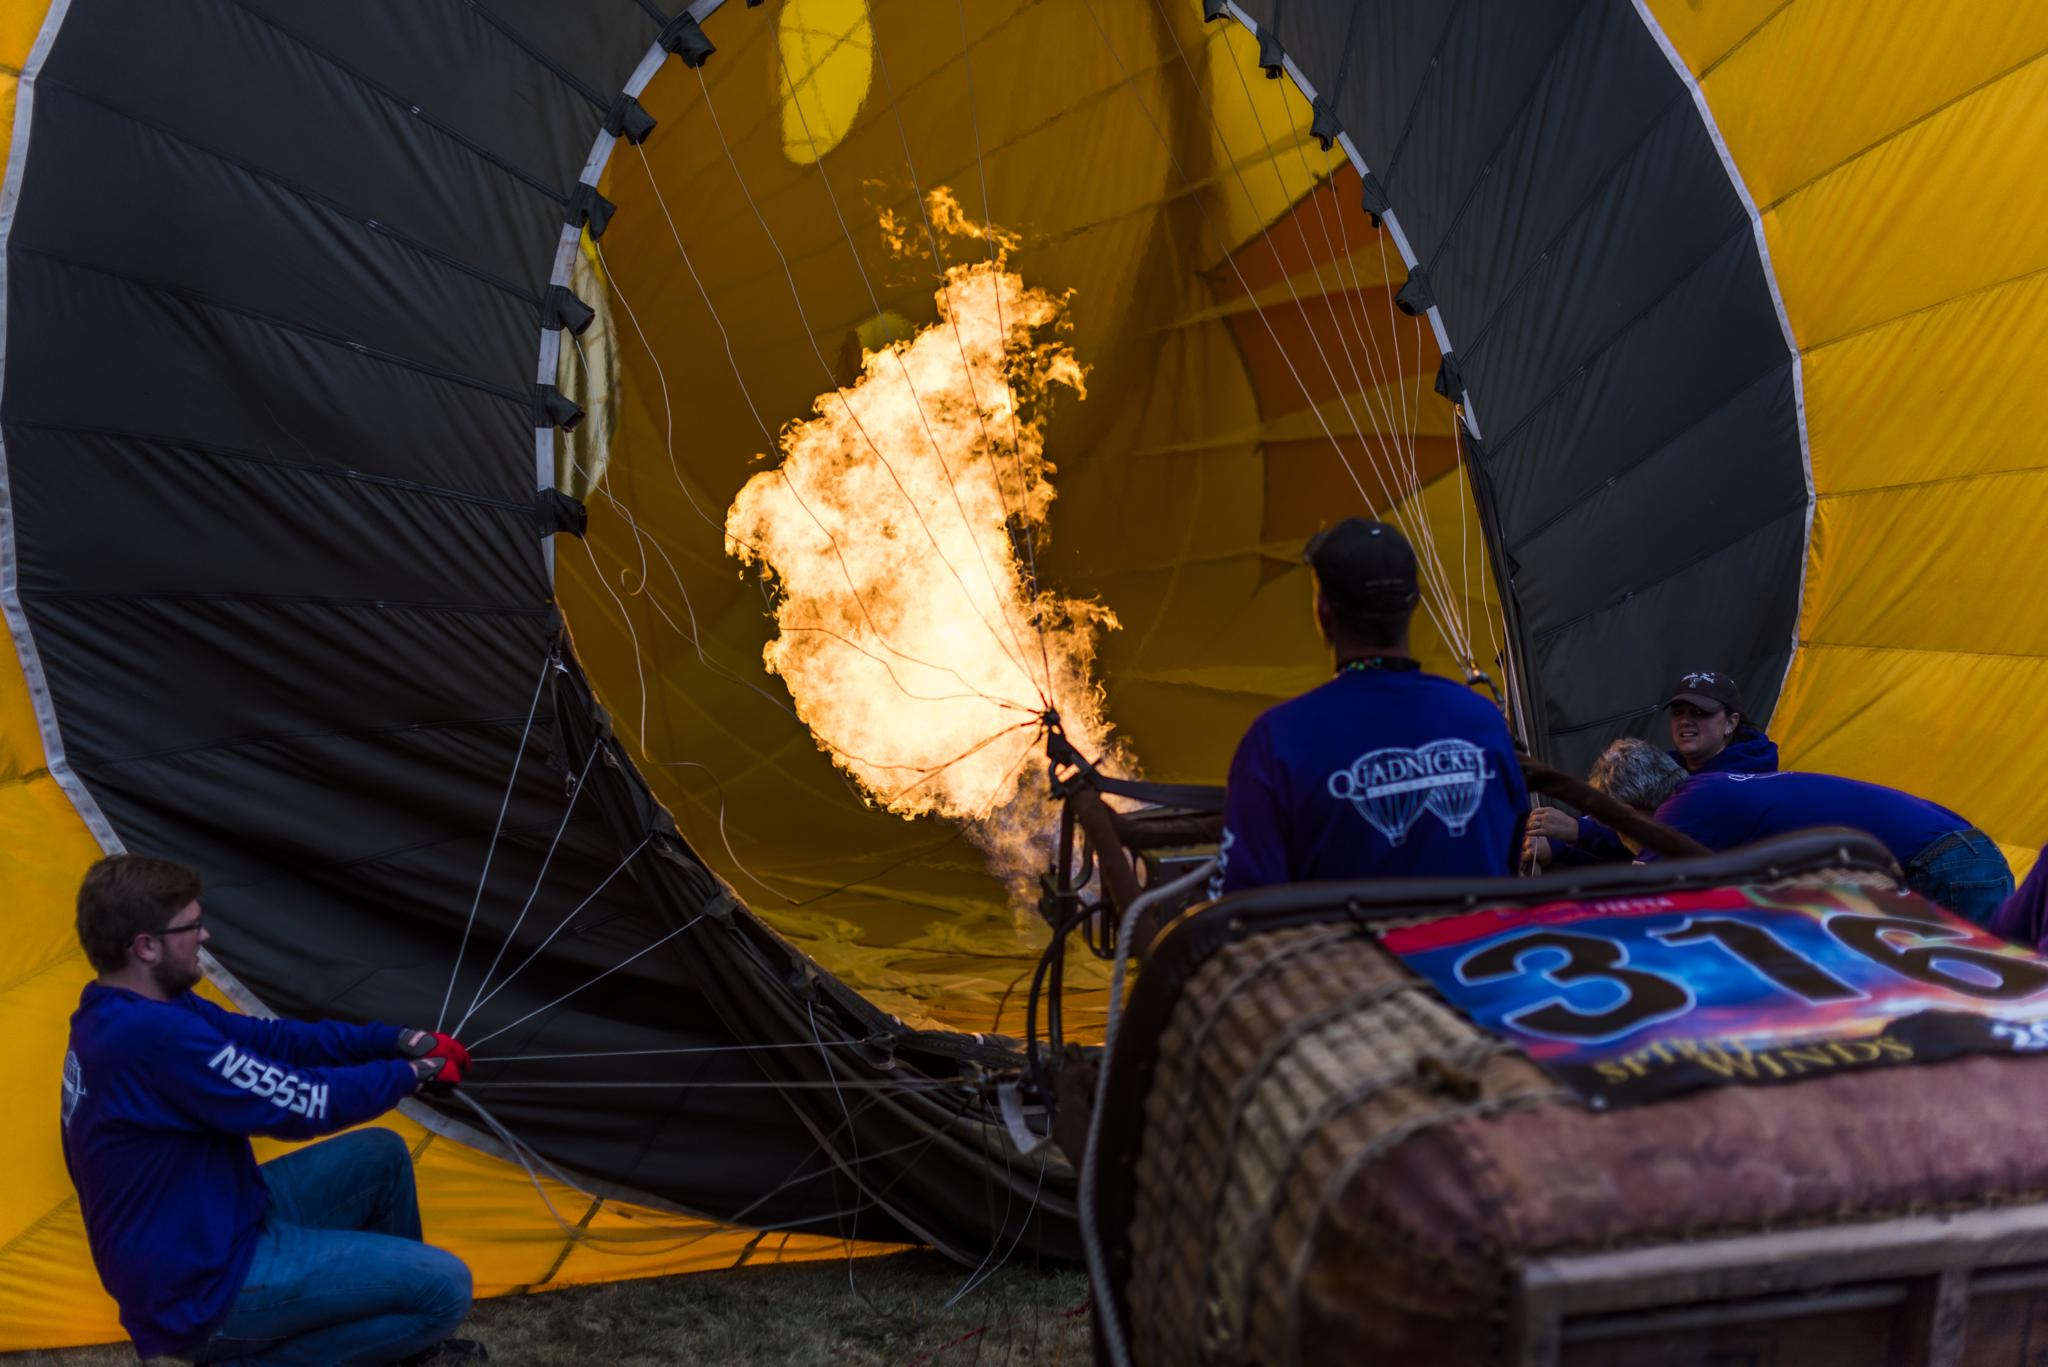 Firing Up the Balloon by Cary Leppert